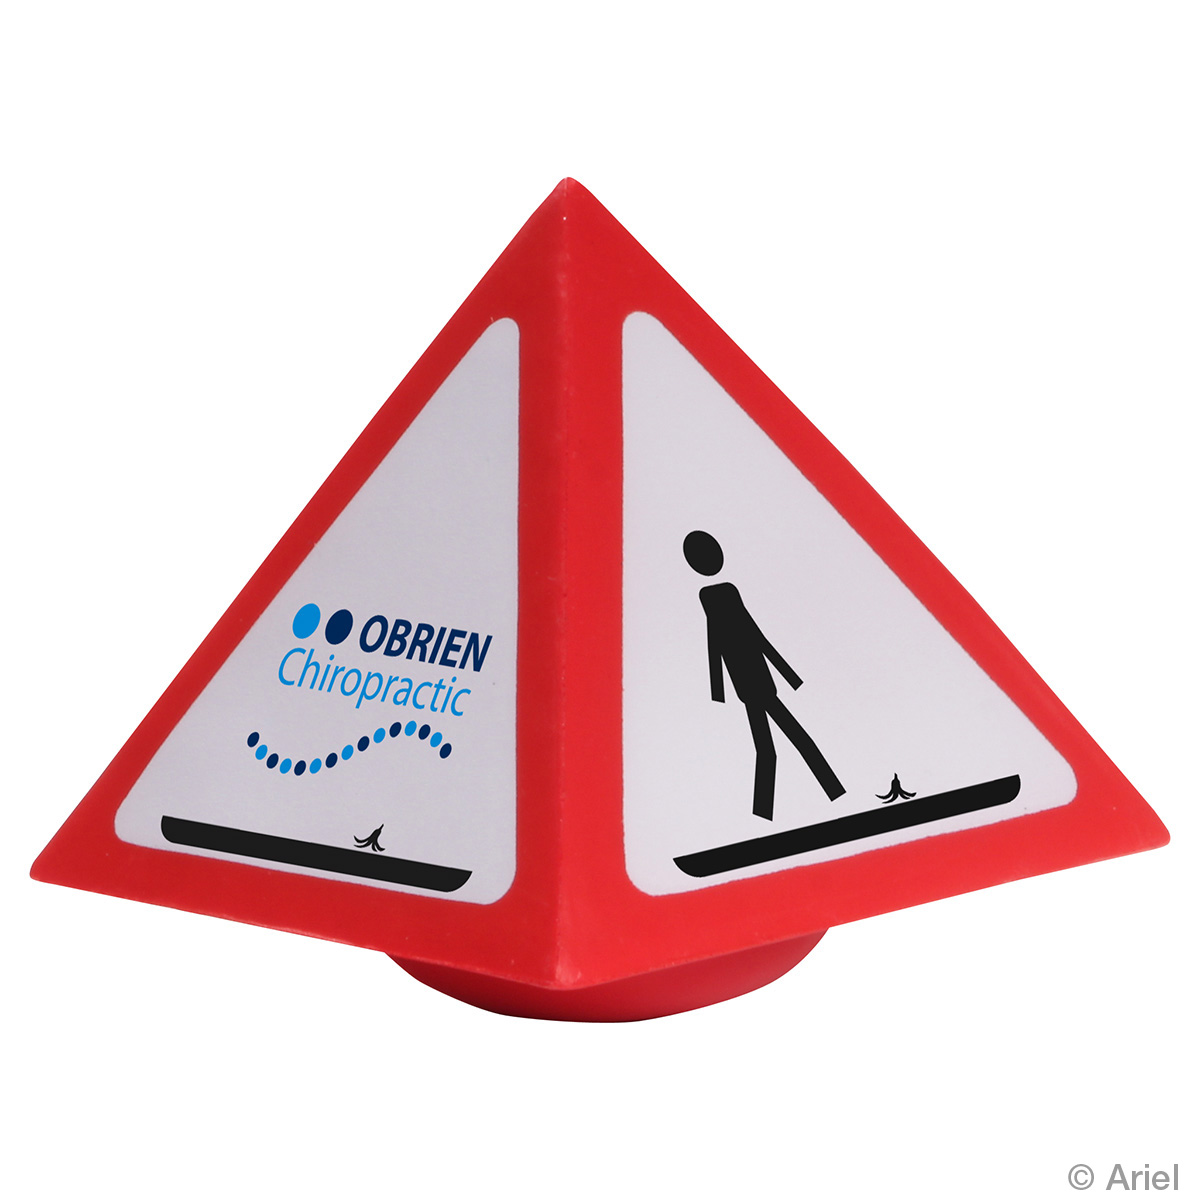 Warning Stress Reliever Wobbler, LWO-WW12, 1 Colour Imprint